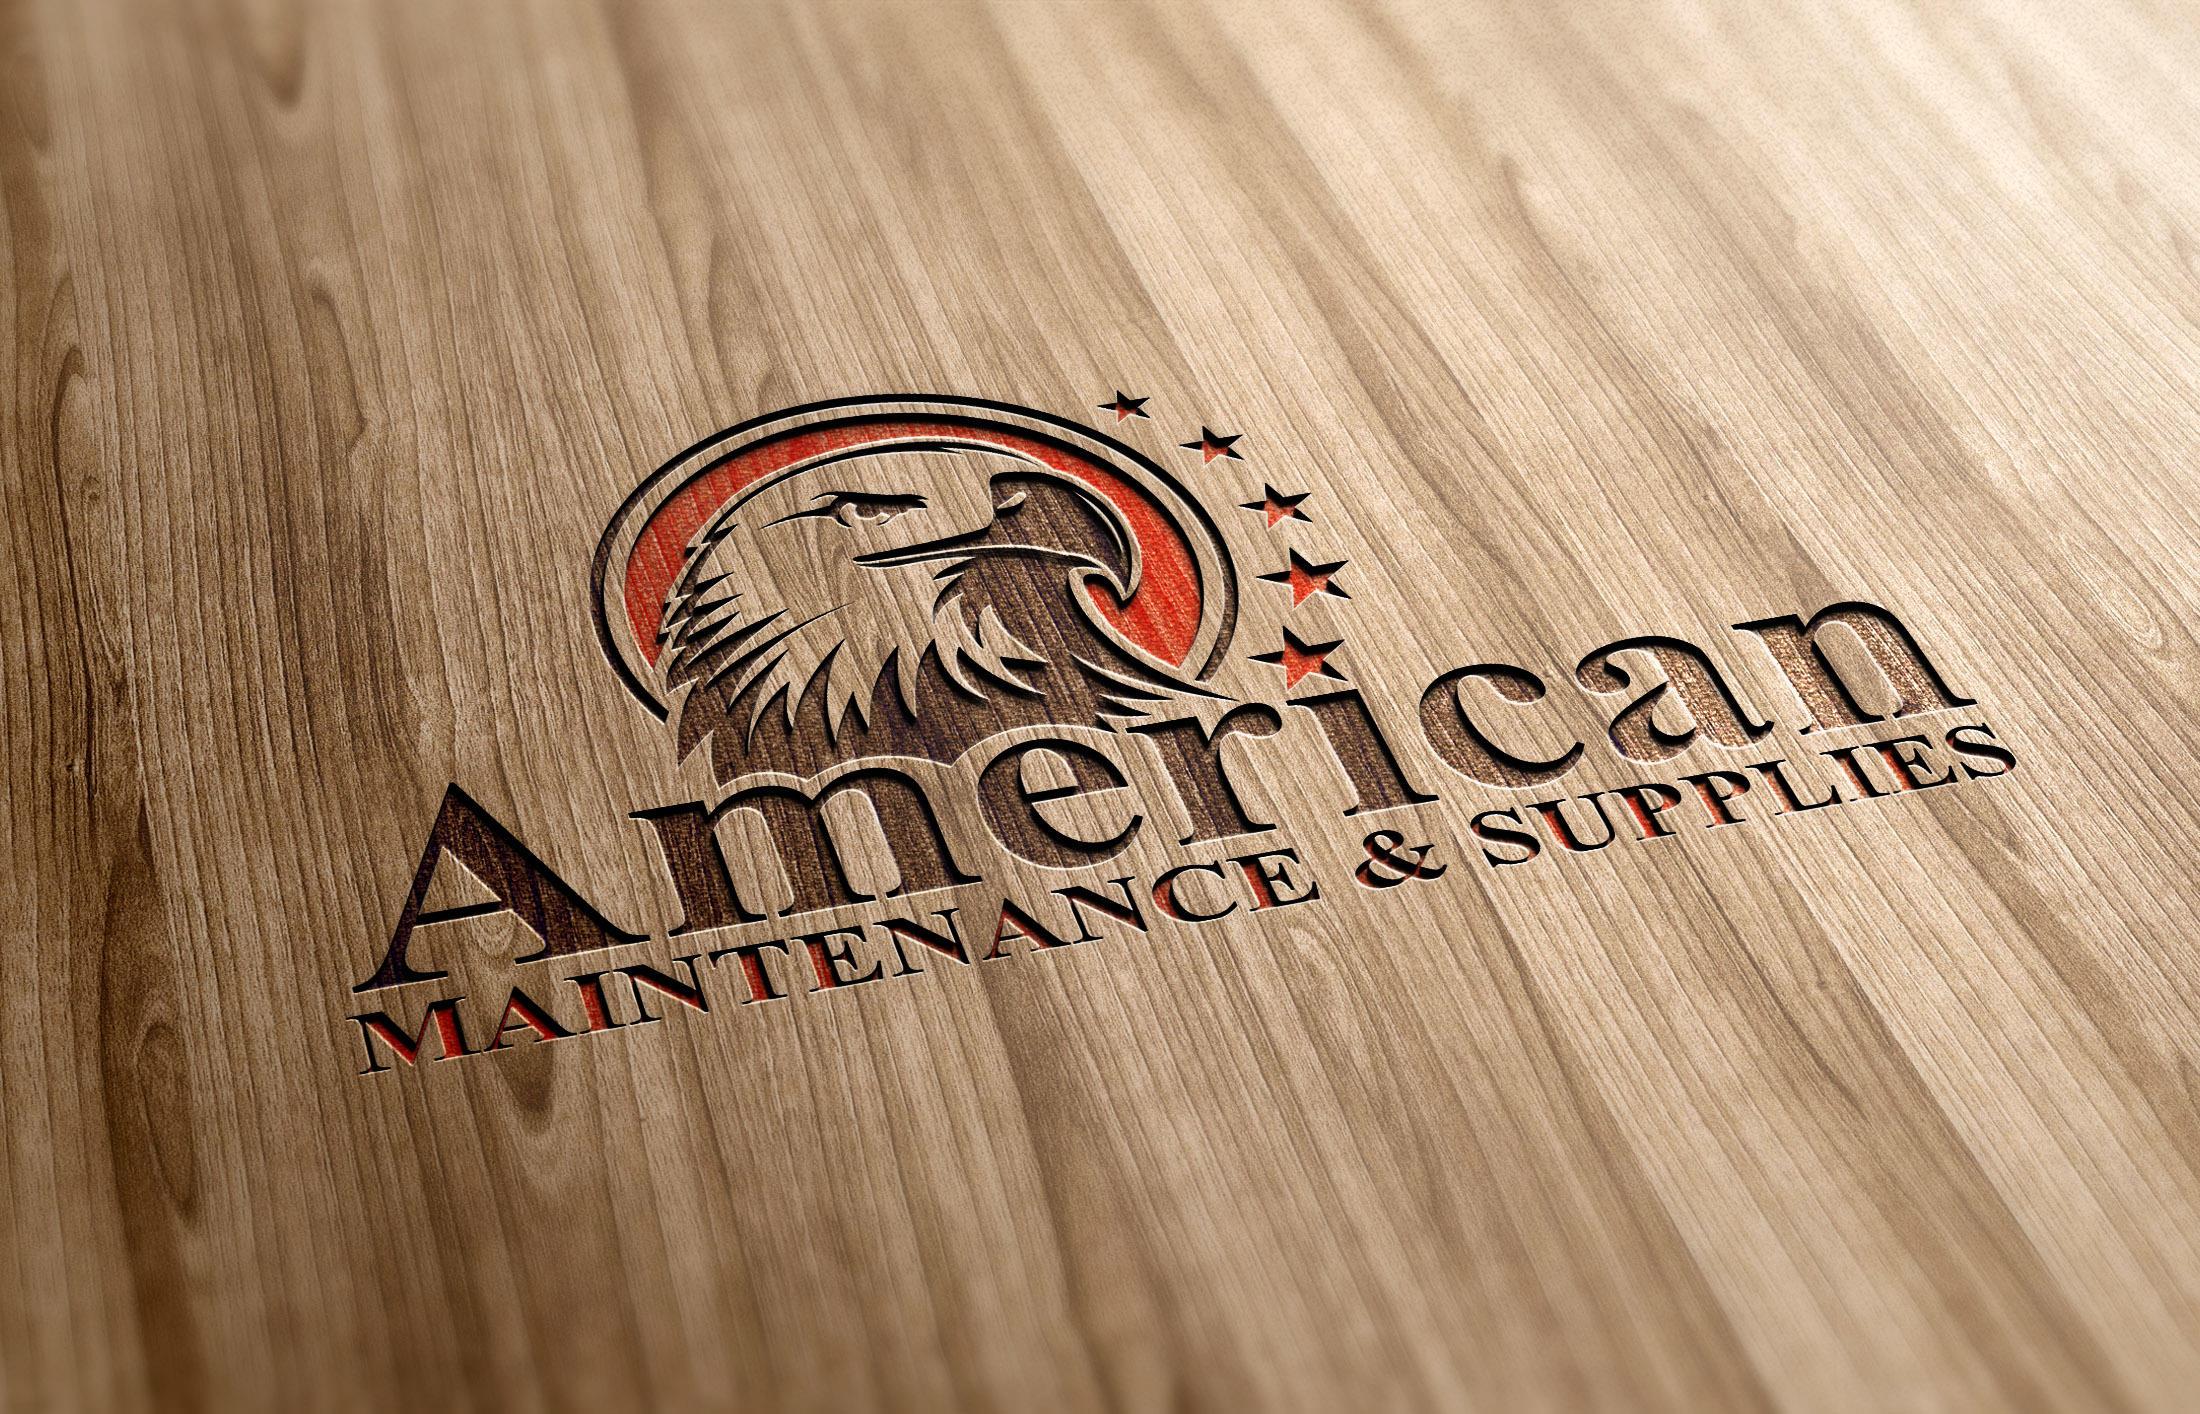 American Maintenance & Supplies, Inc. image 1